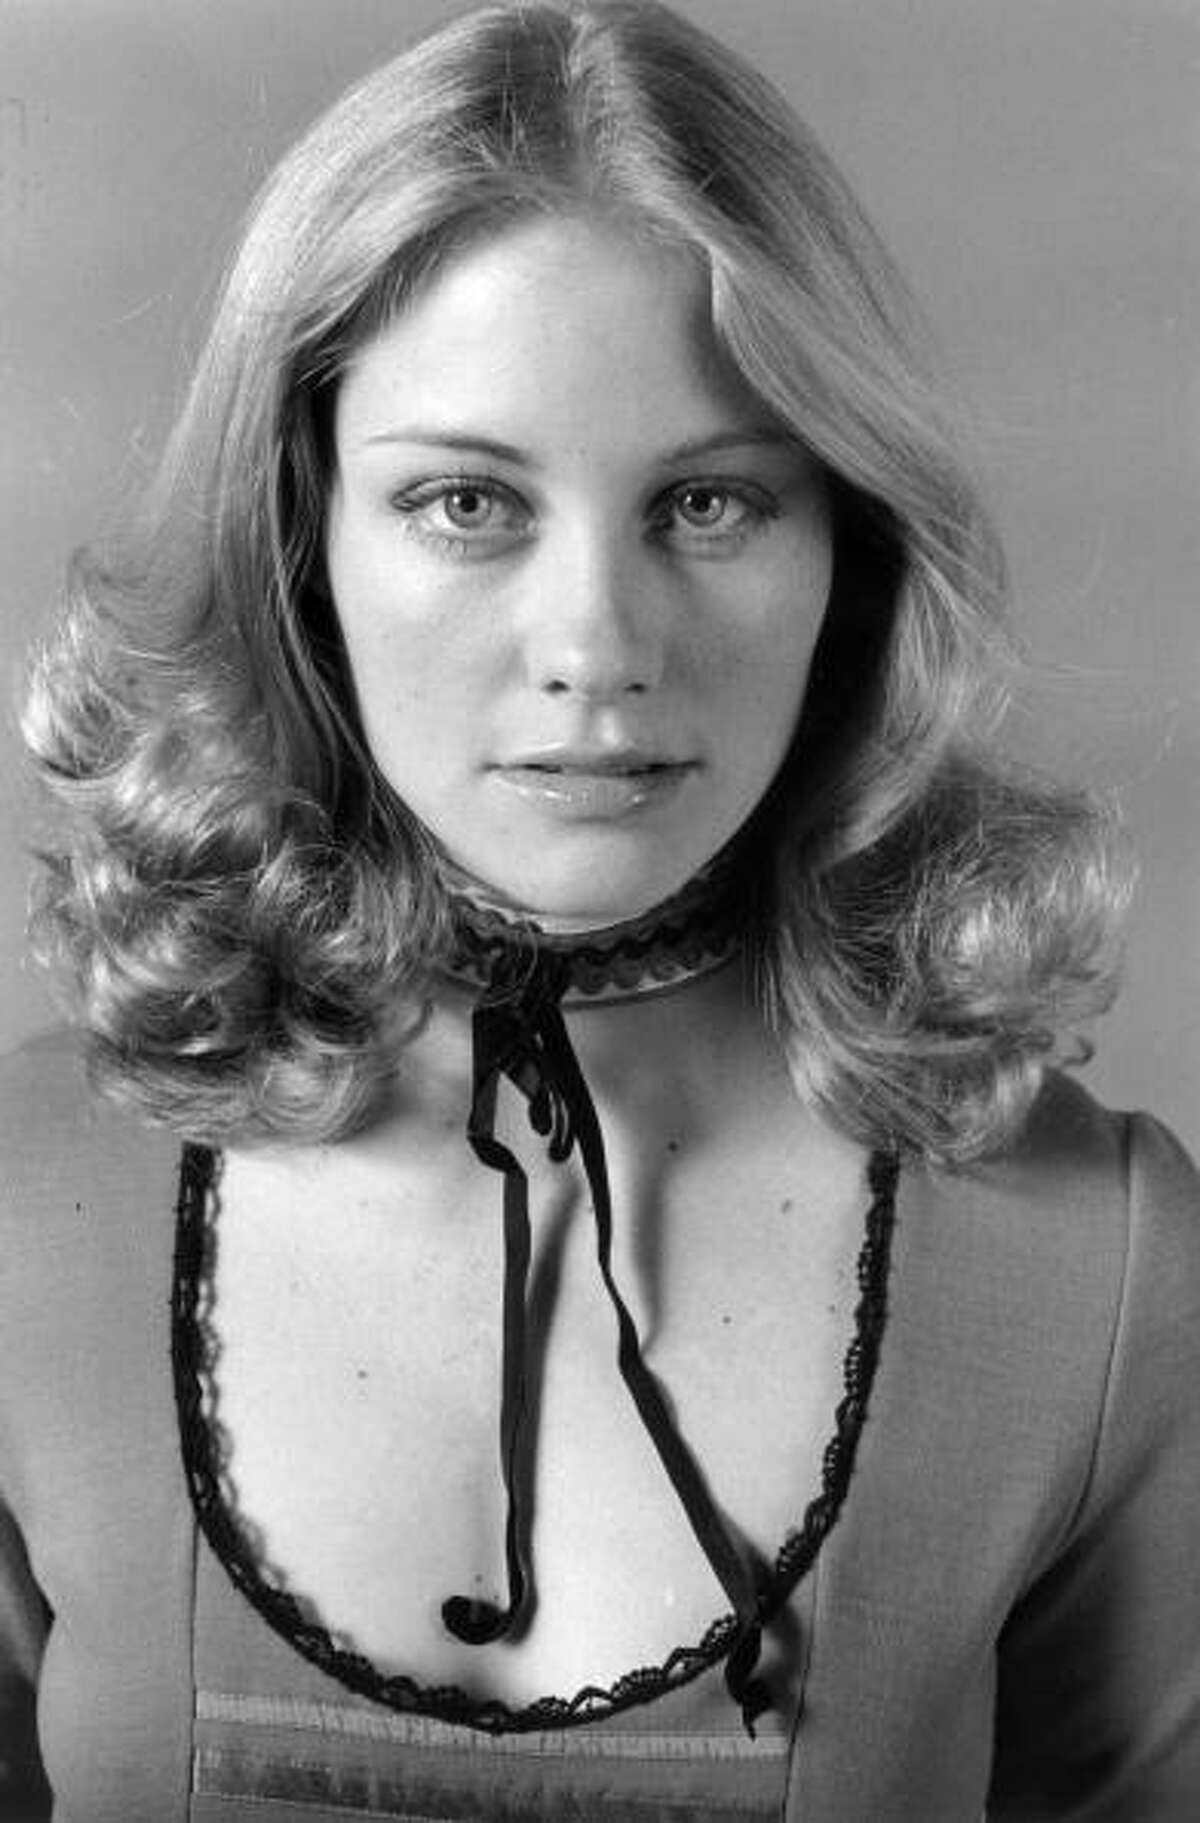 Cybill Shepherd Born: 1950